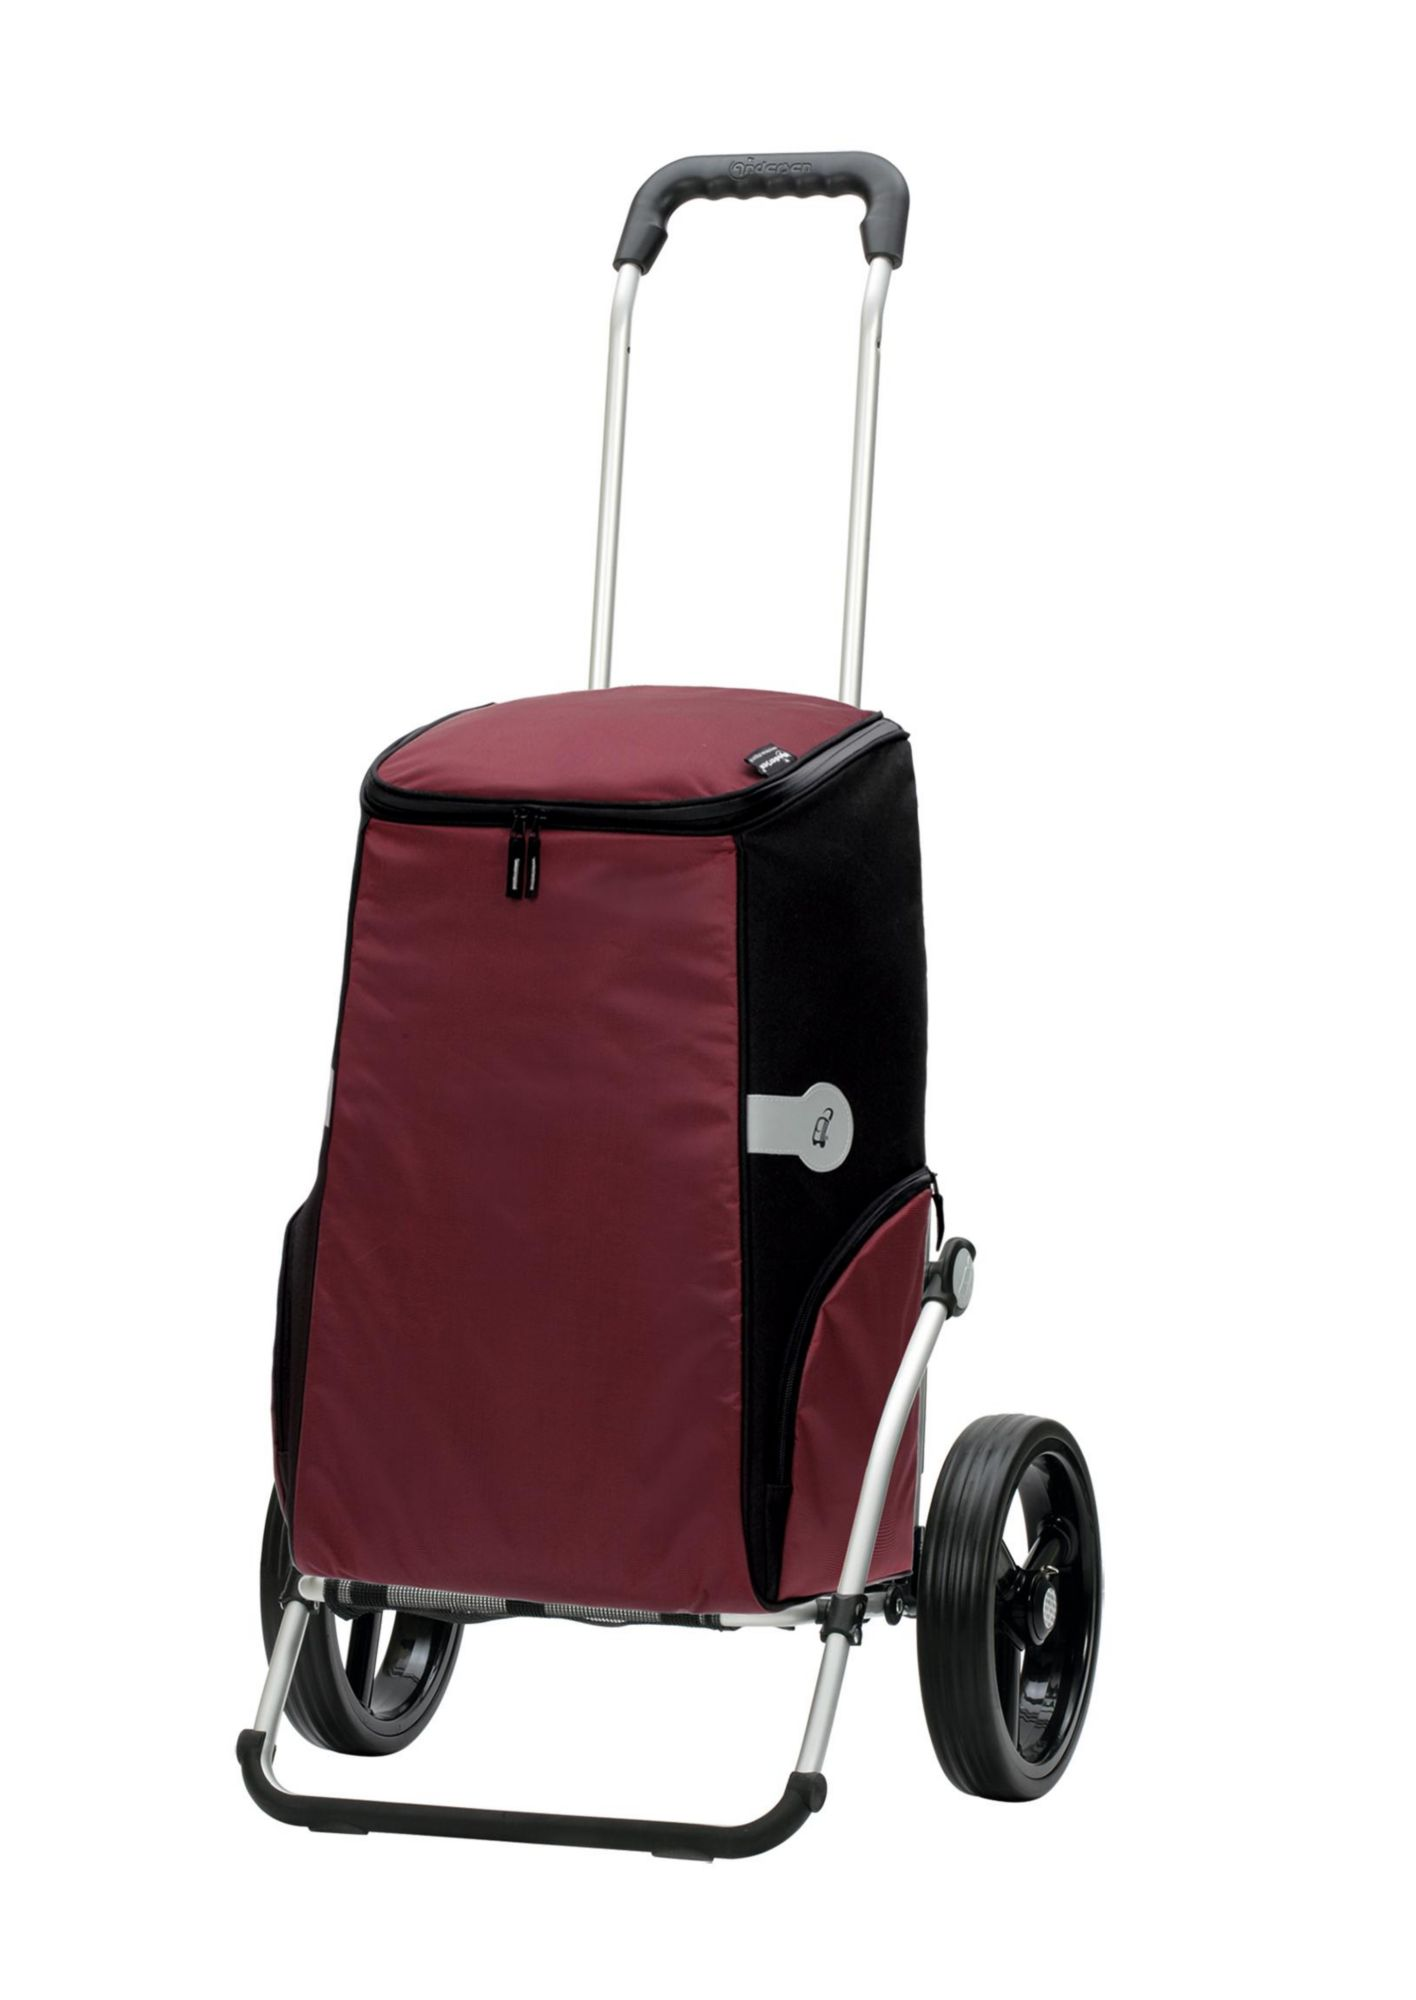 ANDERSEN Andersen Einkauftrolley »Royal Shopper® Haron« mit Alu Fahrgestell